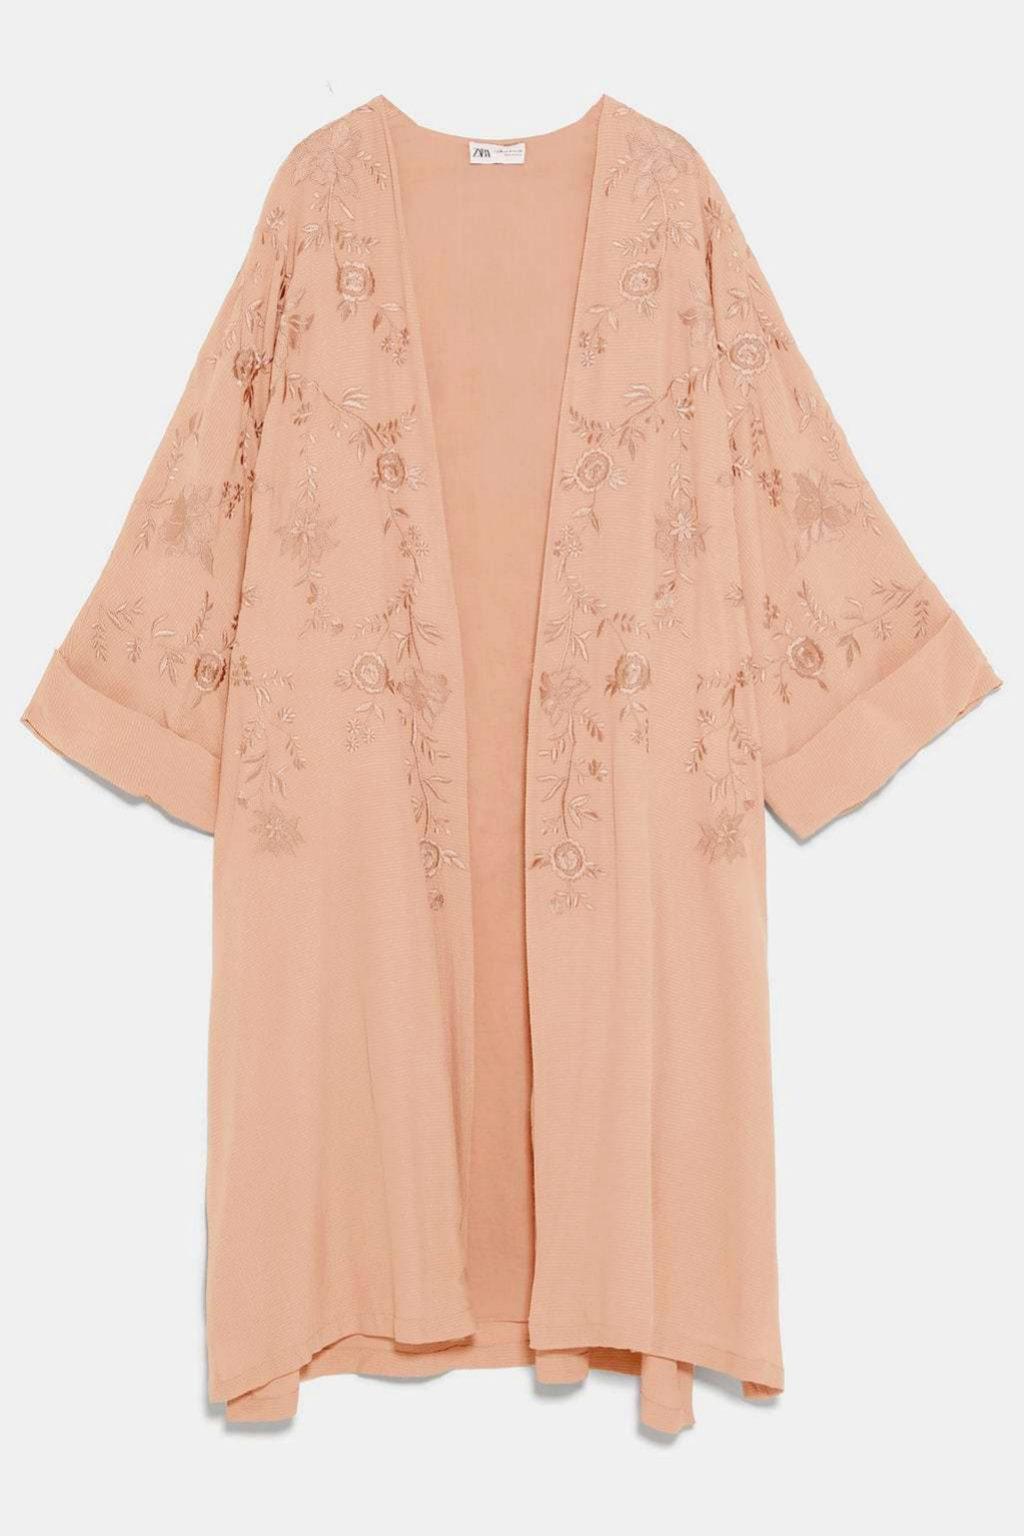 Kimono bordado en color maquillaje de edición limitada de Zara (69,95¤)